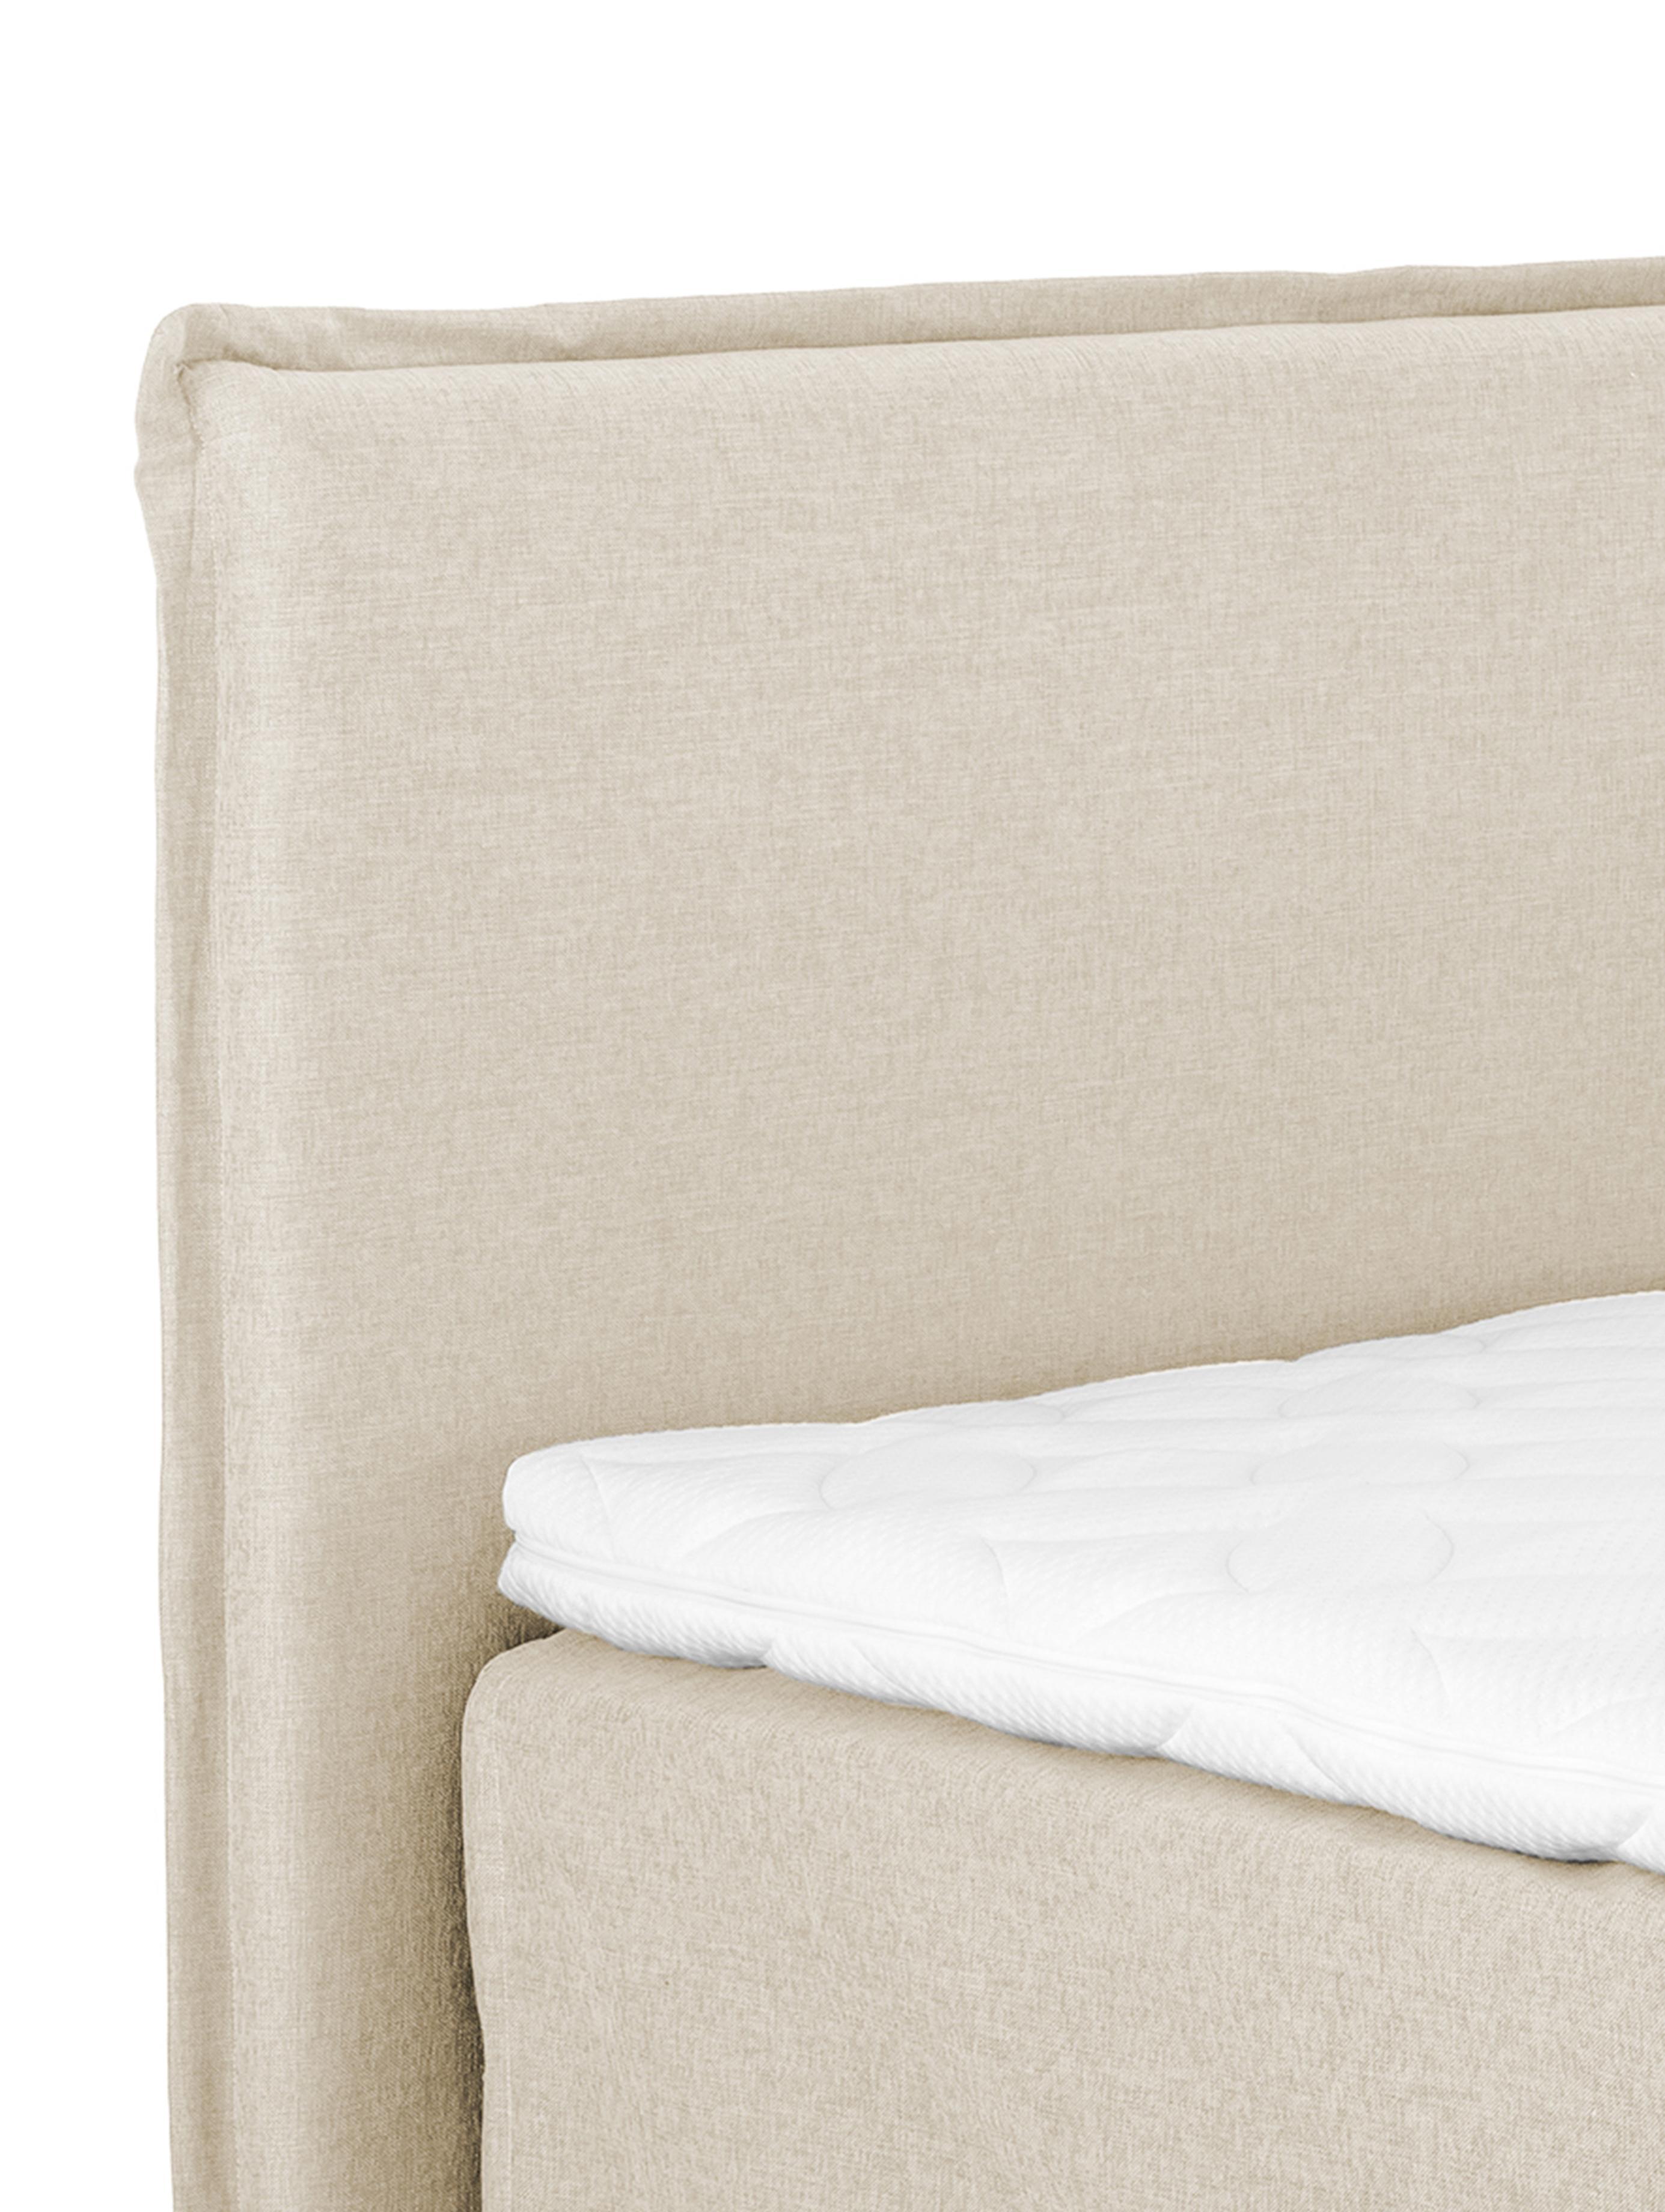 Premium Boxspringbett Violet, Matratze: 7-Zonen-Taschenfederkern , Füße: Massives Buchenholz, lack, Beige, 160 x 200 cm